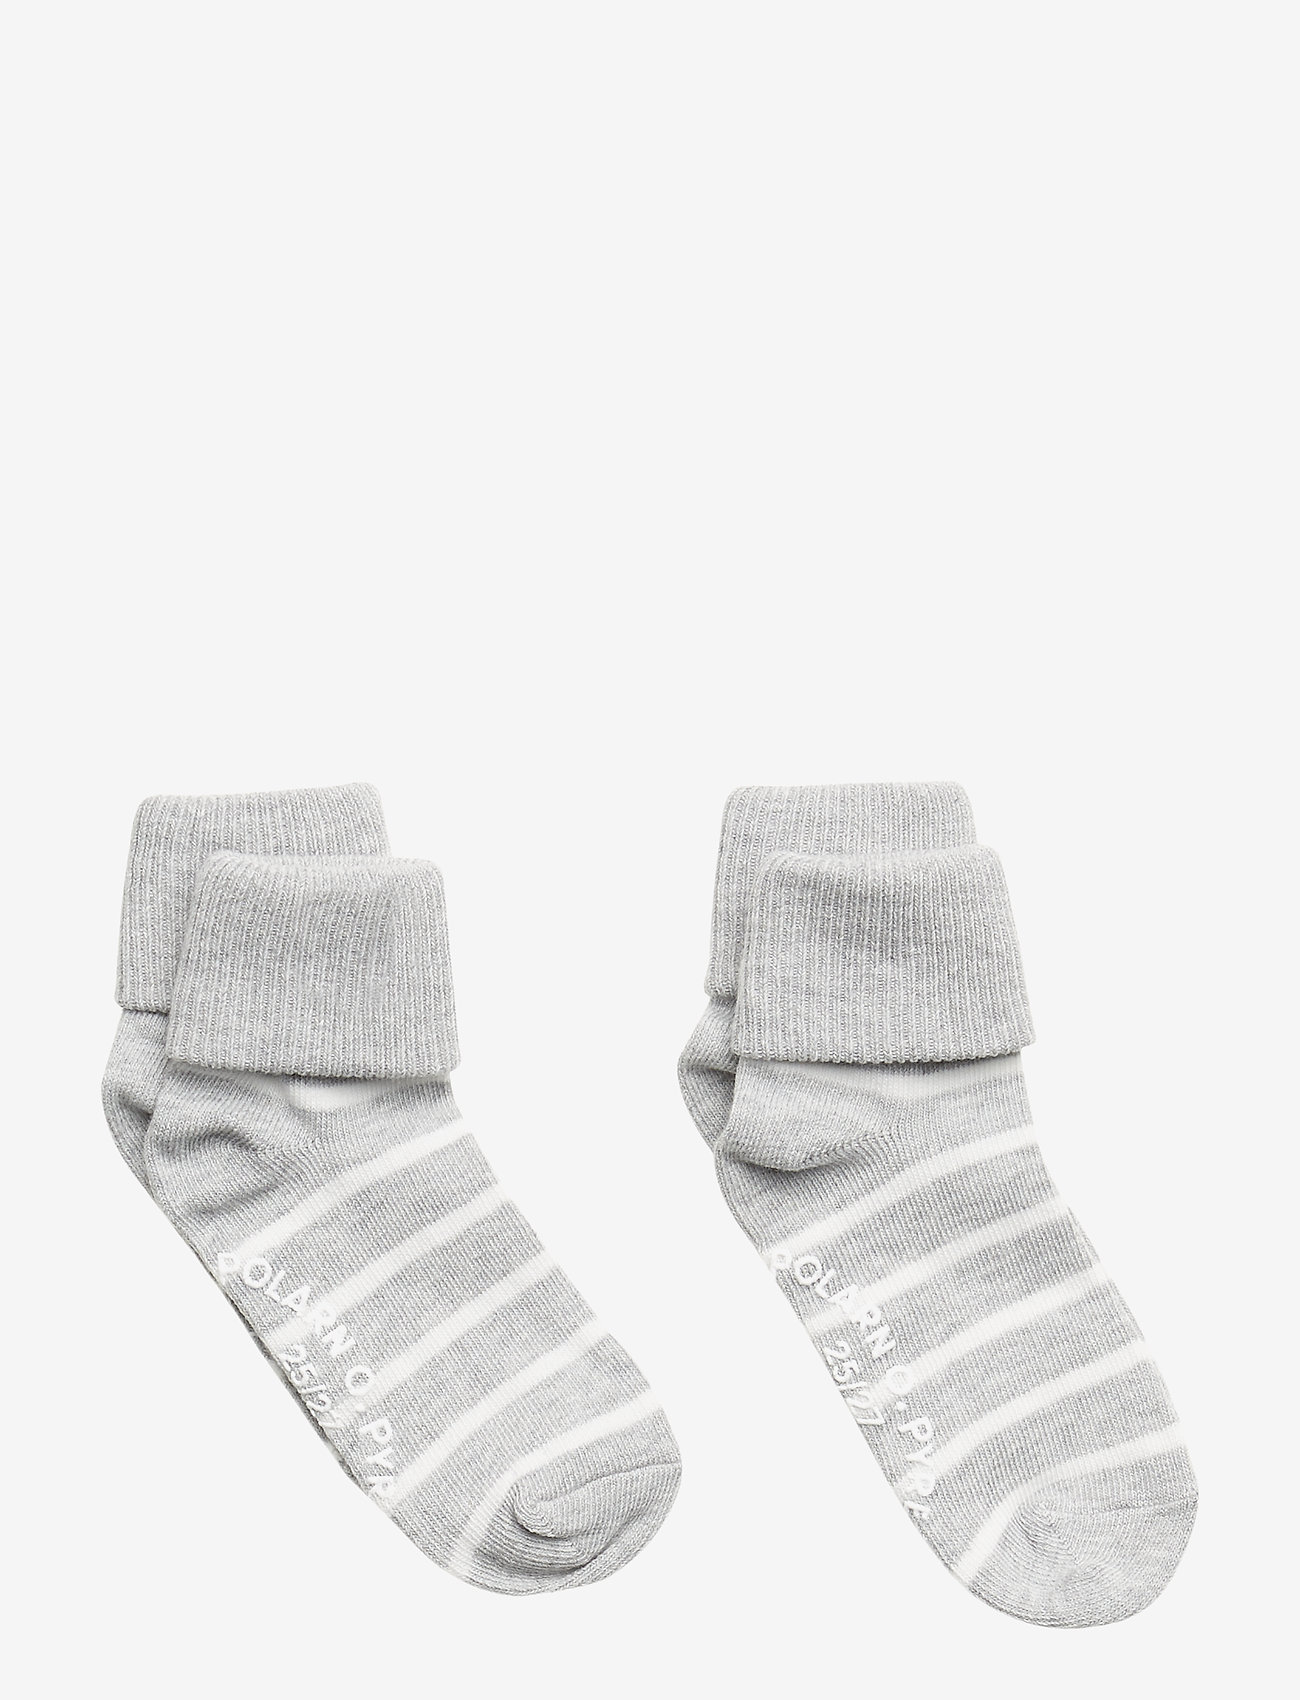 Polarn O. Pyret - Socks 2-P Turn-up Anti Slip PO.P Stripe - greymelange - 1